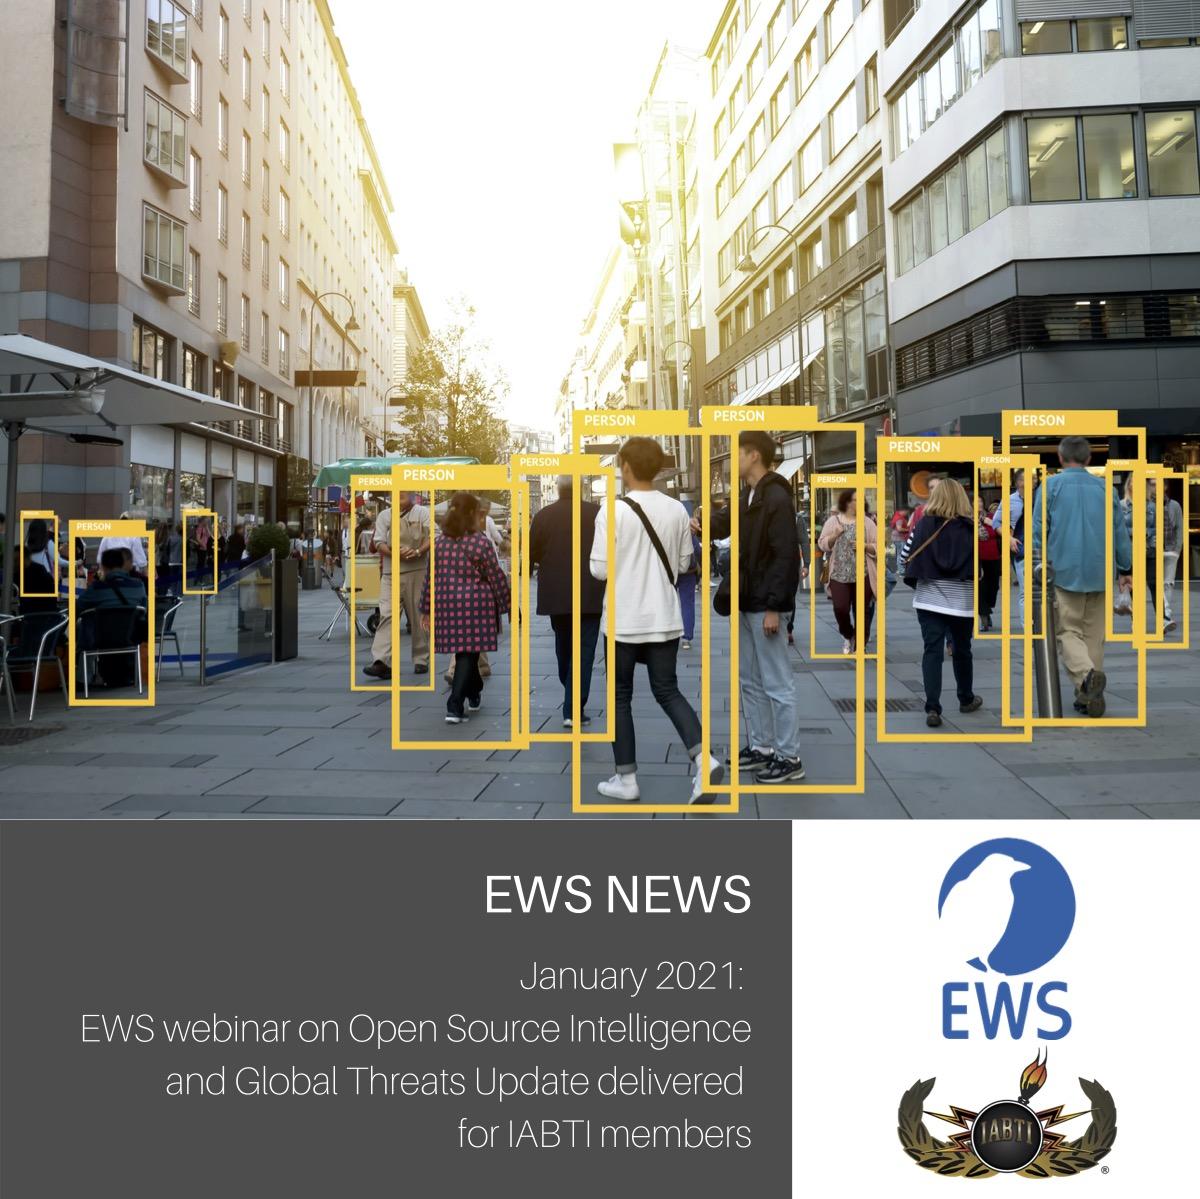 Global Threat Update webinar delivered to IABTI members by EWS